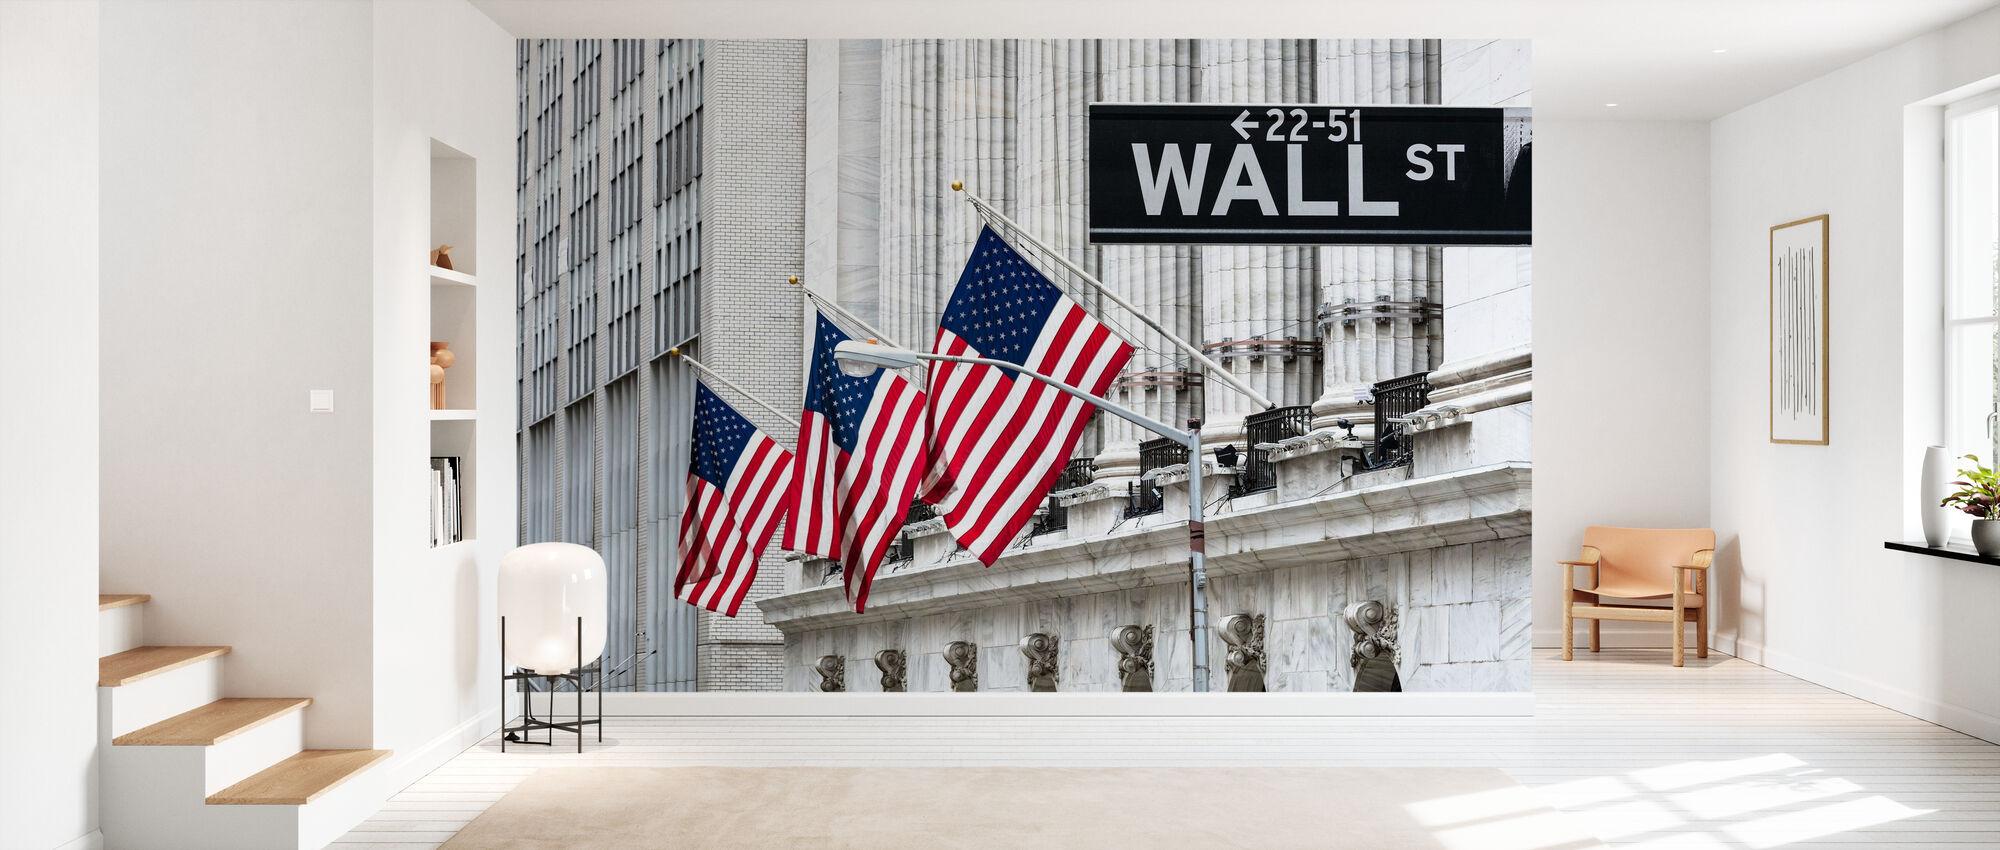 New York Wall Street - Wallpaper - Hallway